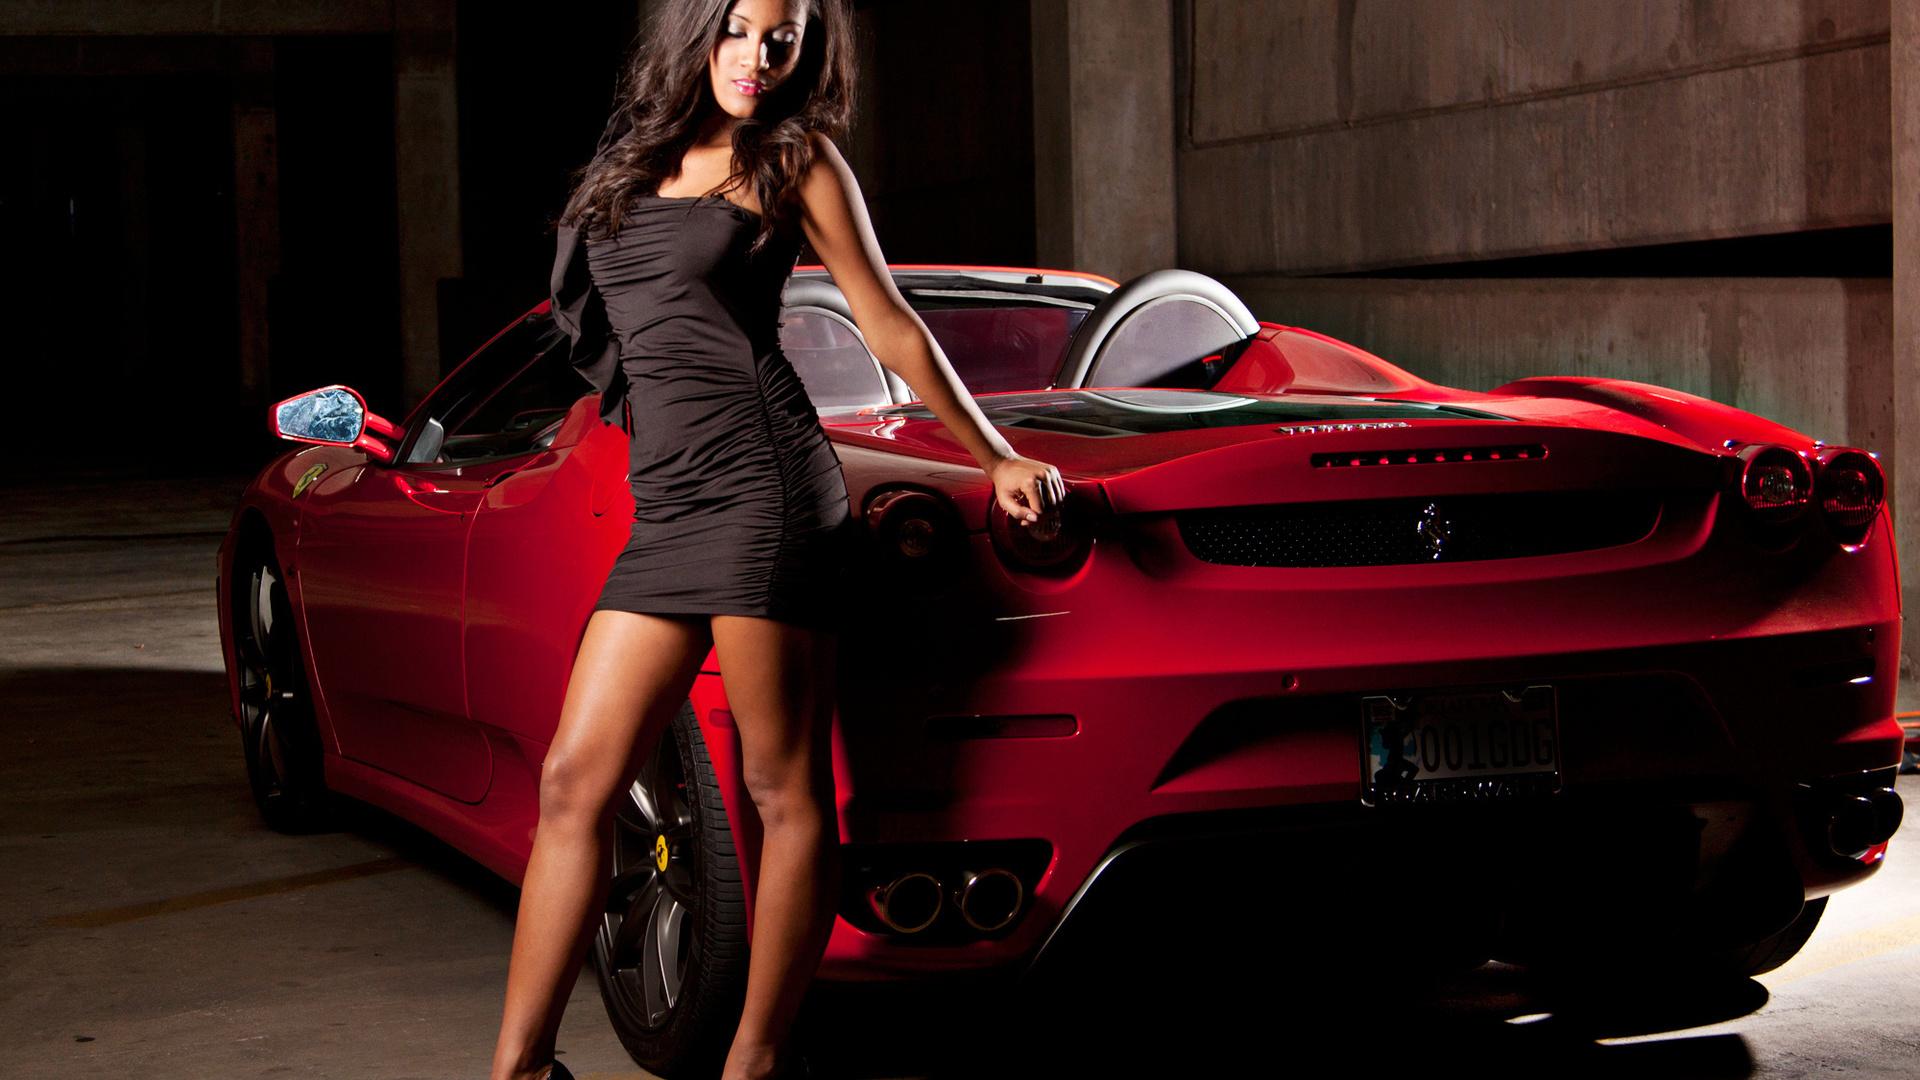 машина, секси, девушка, Ferrari, тачка, брюнетка